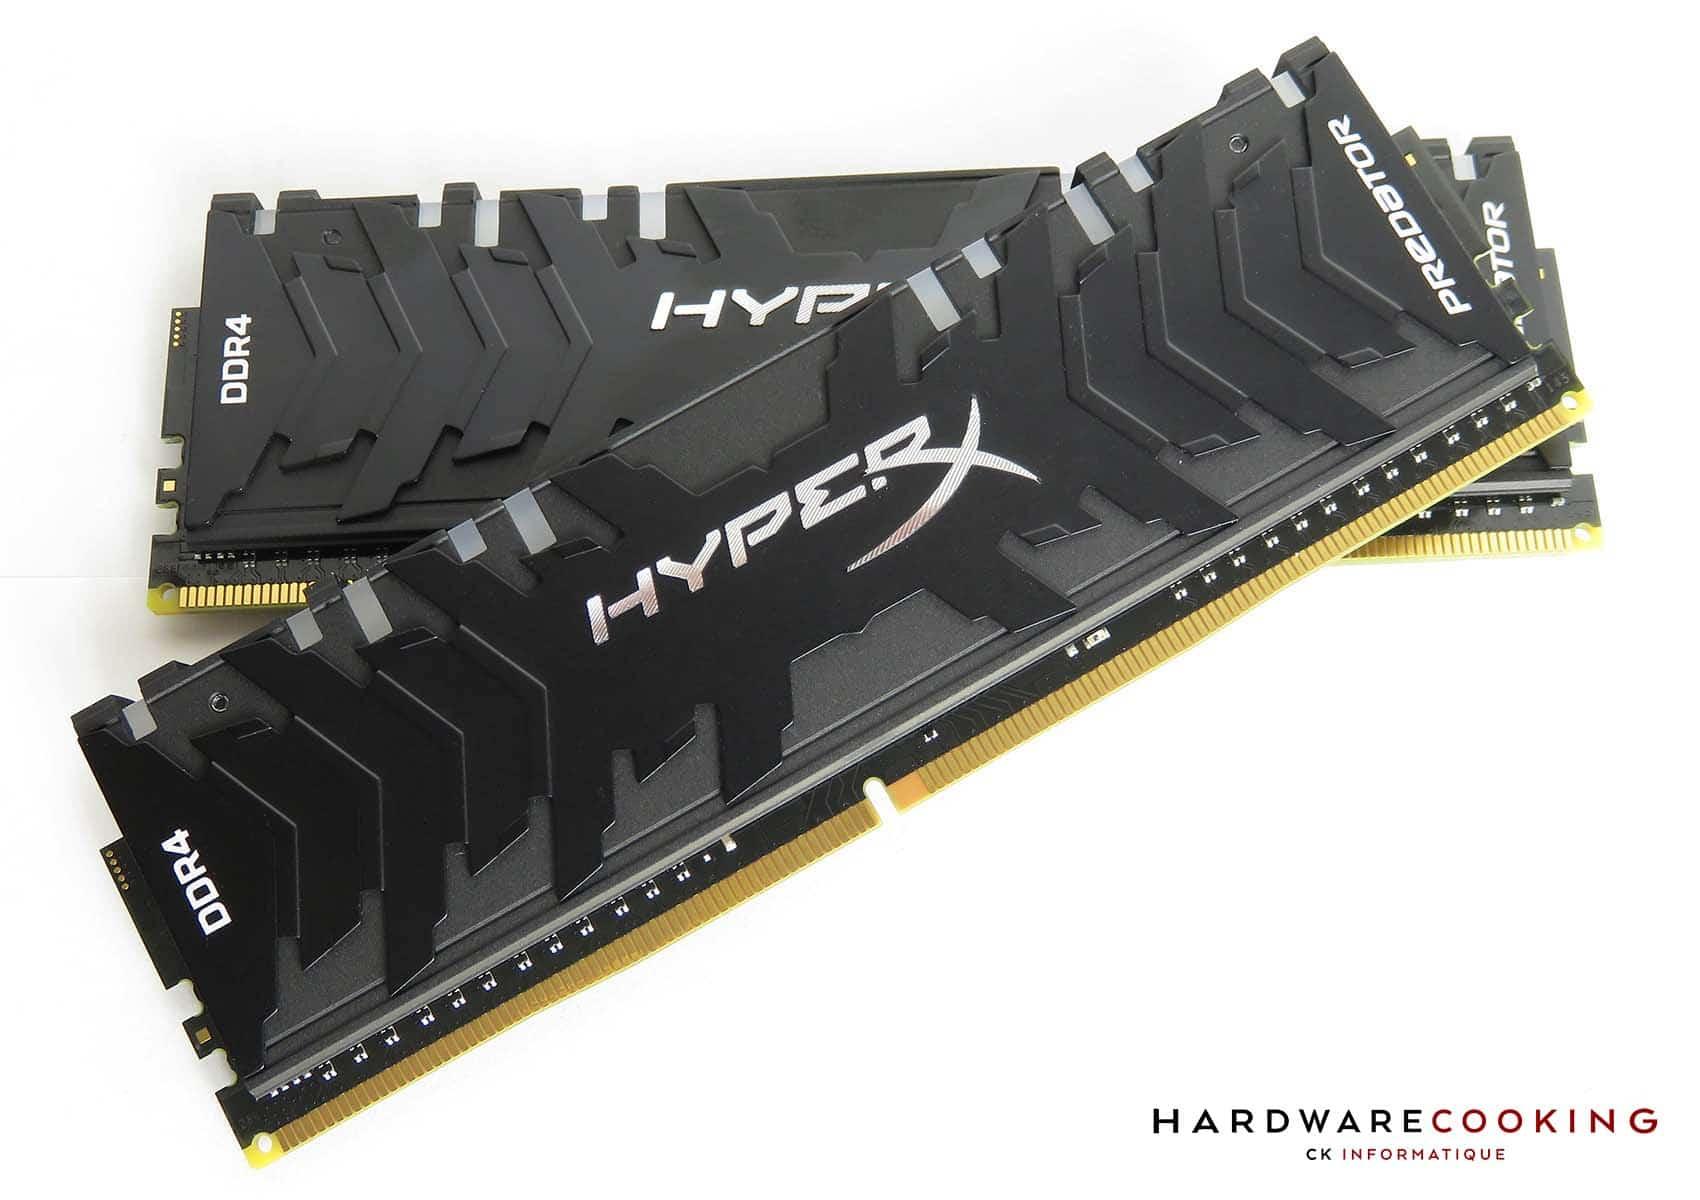 Test HyperX Predator RGB design